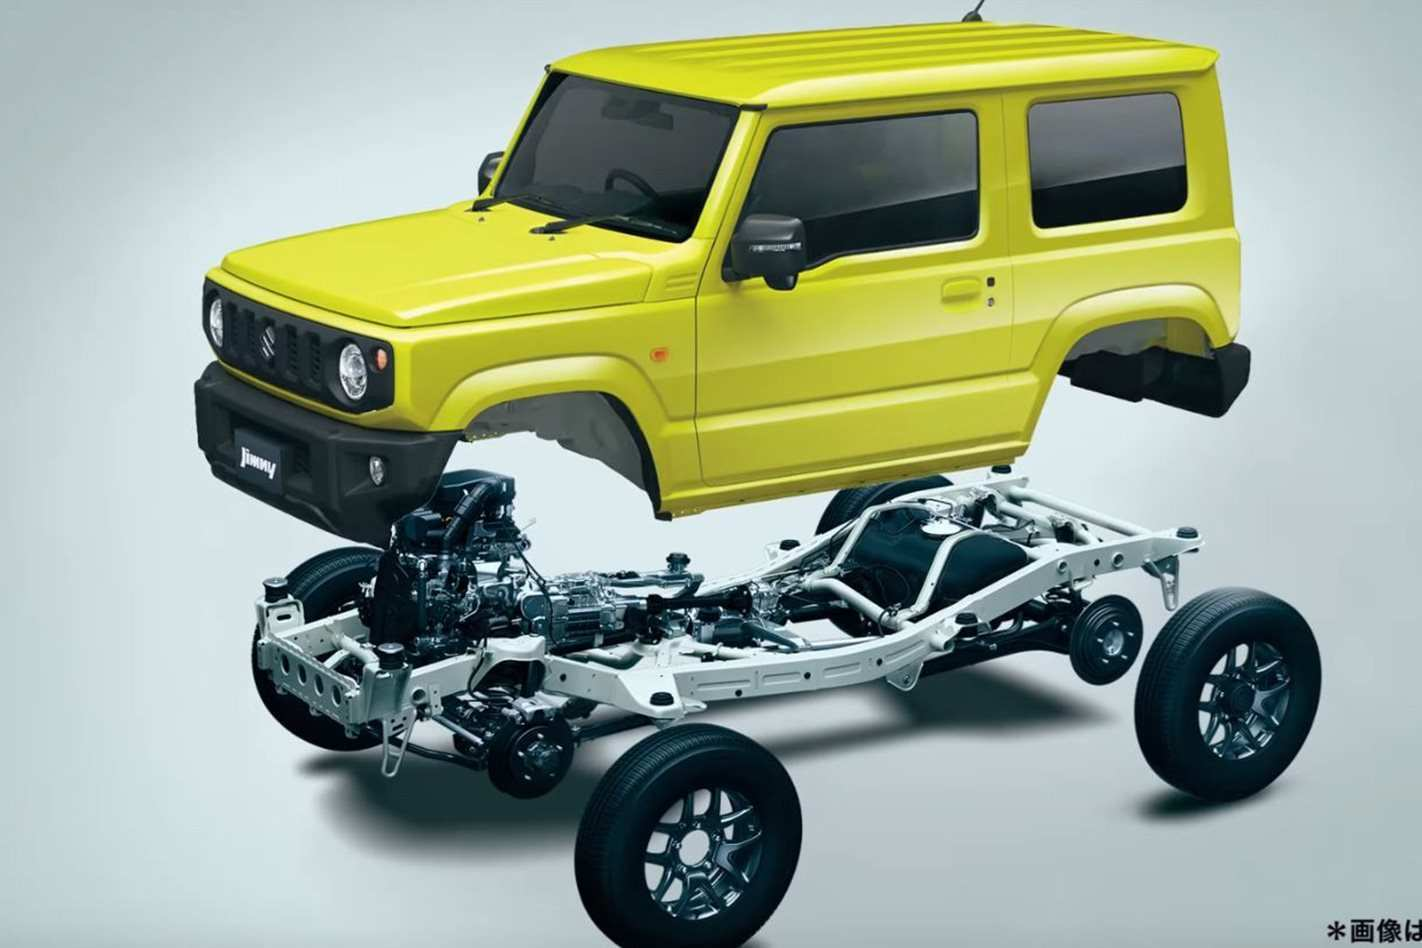 94 New 2019 Suzuki Jimny Pictures with 2019 Suzuki Jimny